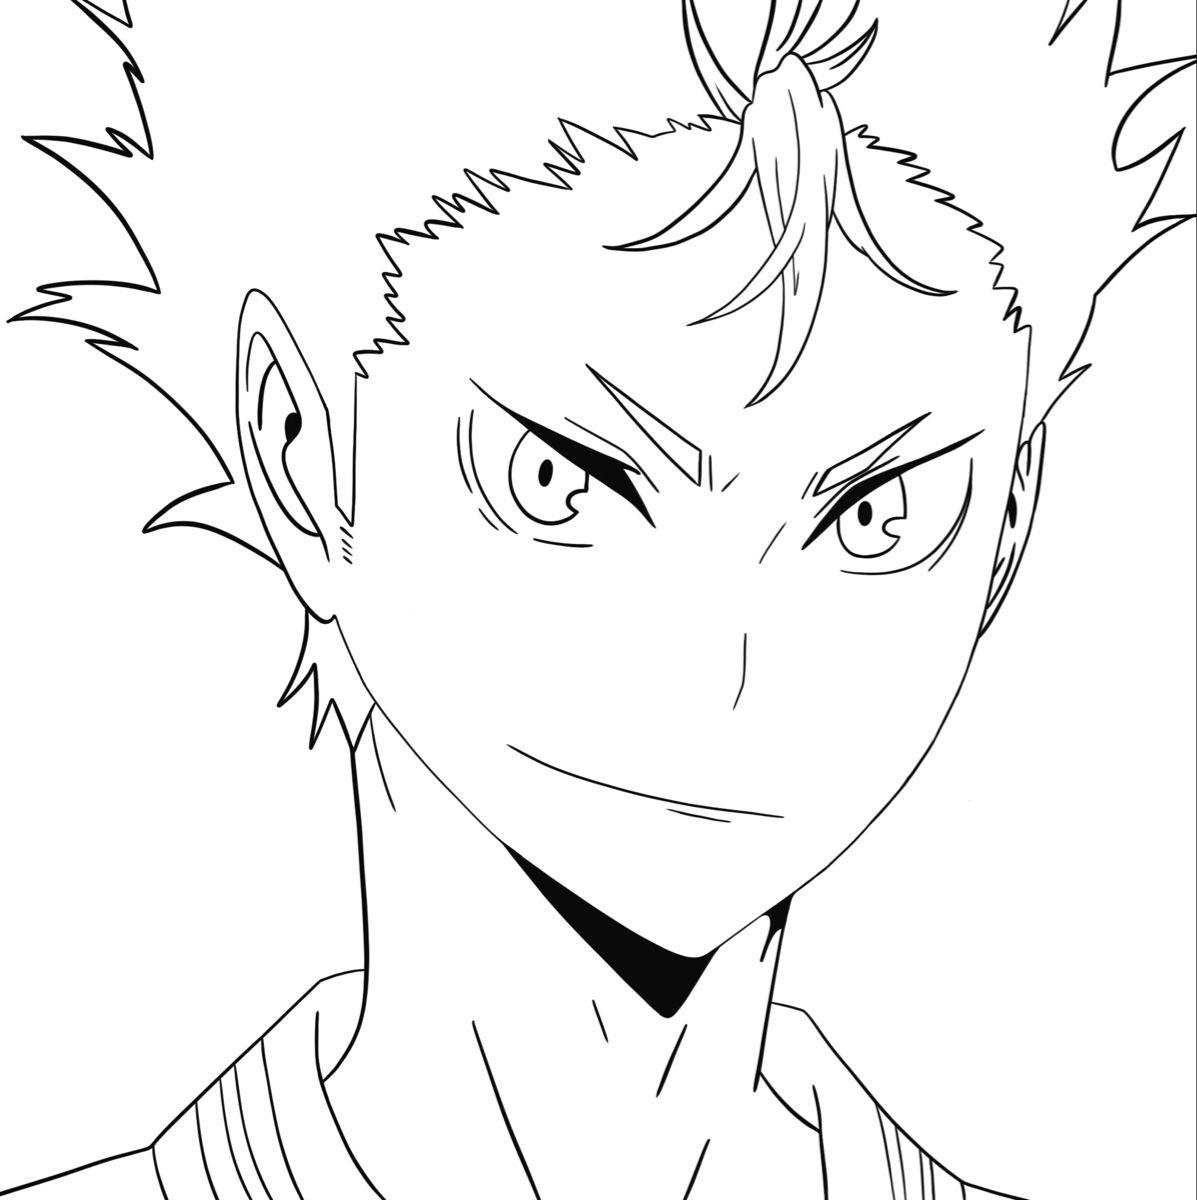 Nishinoya Coloring Page 1 Anime Character Drawing Anime Drawings Sketches Outline Drawings